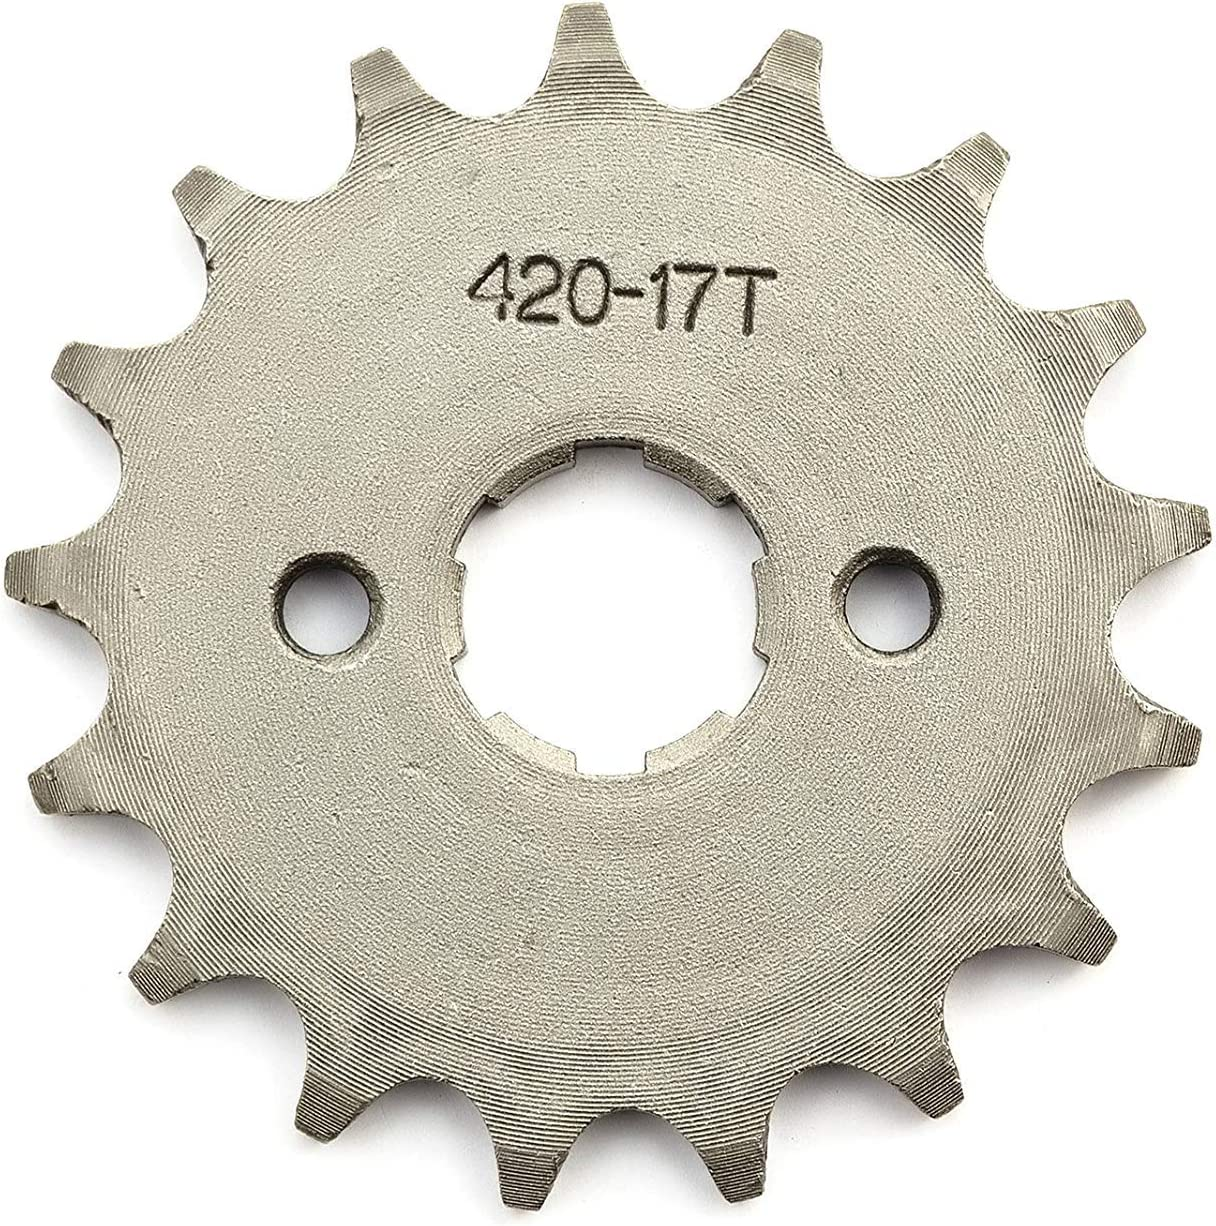 Pit Dirt Bike Quad ATV Front Sprocket 420 17 Tooth 20mm Hole 110cc 125cc 140cc